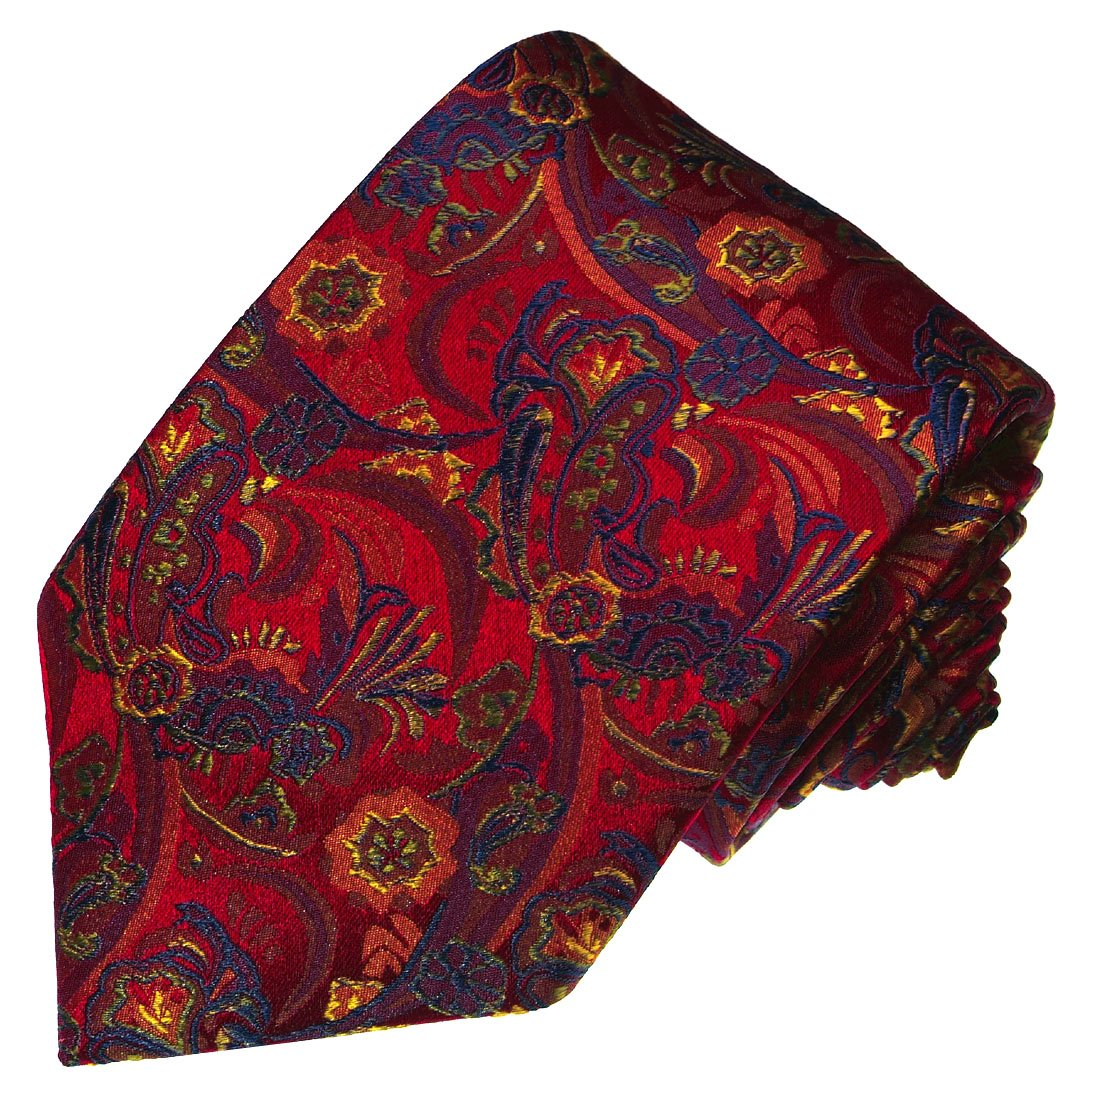 Lorenzo Cana - Luxus Krawatte aus 100% Seide in den aktuellen Trendfarben - rot blau Paisley - 36001